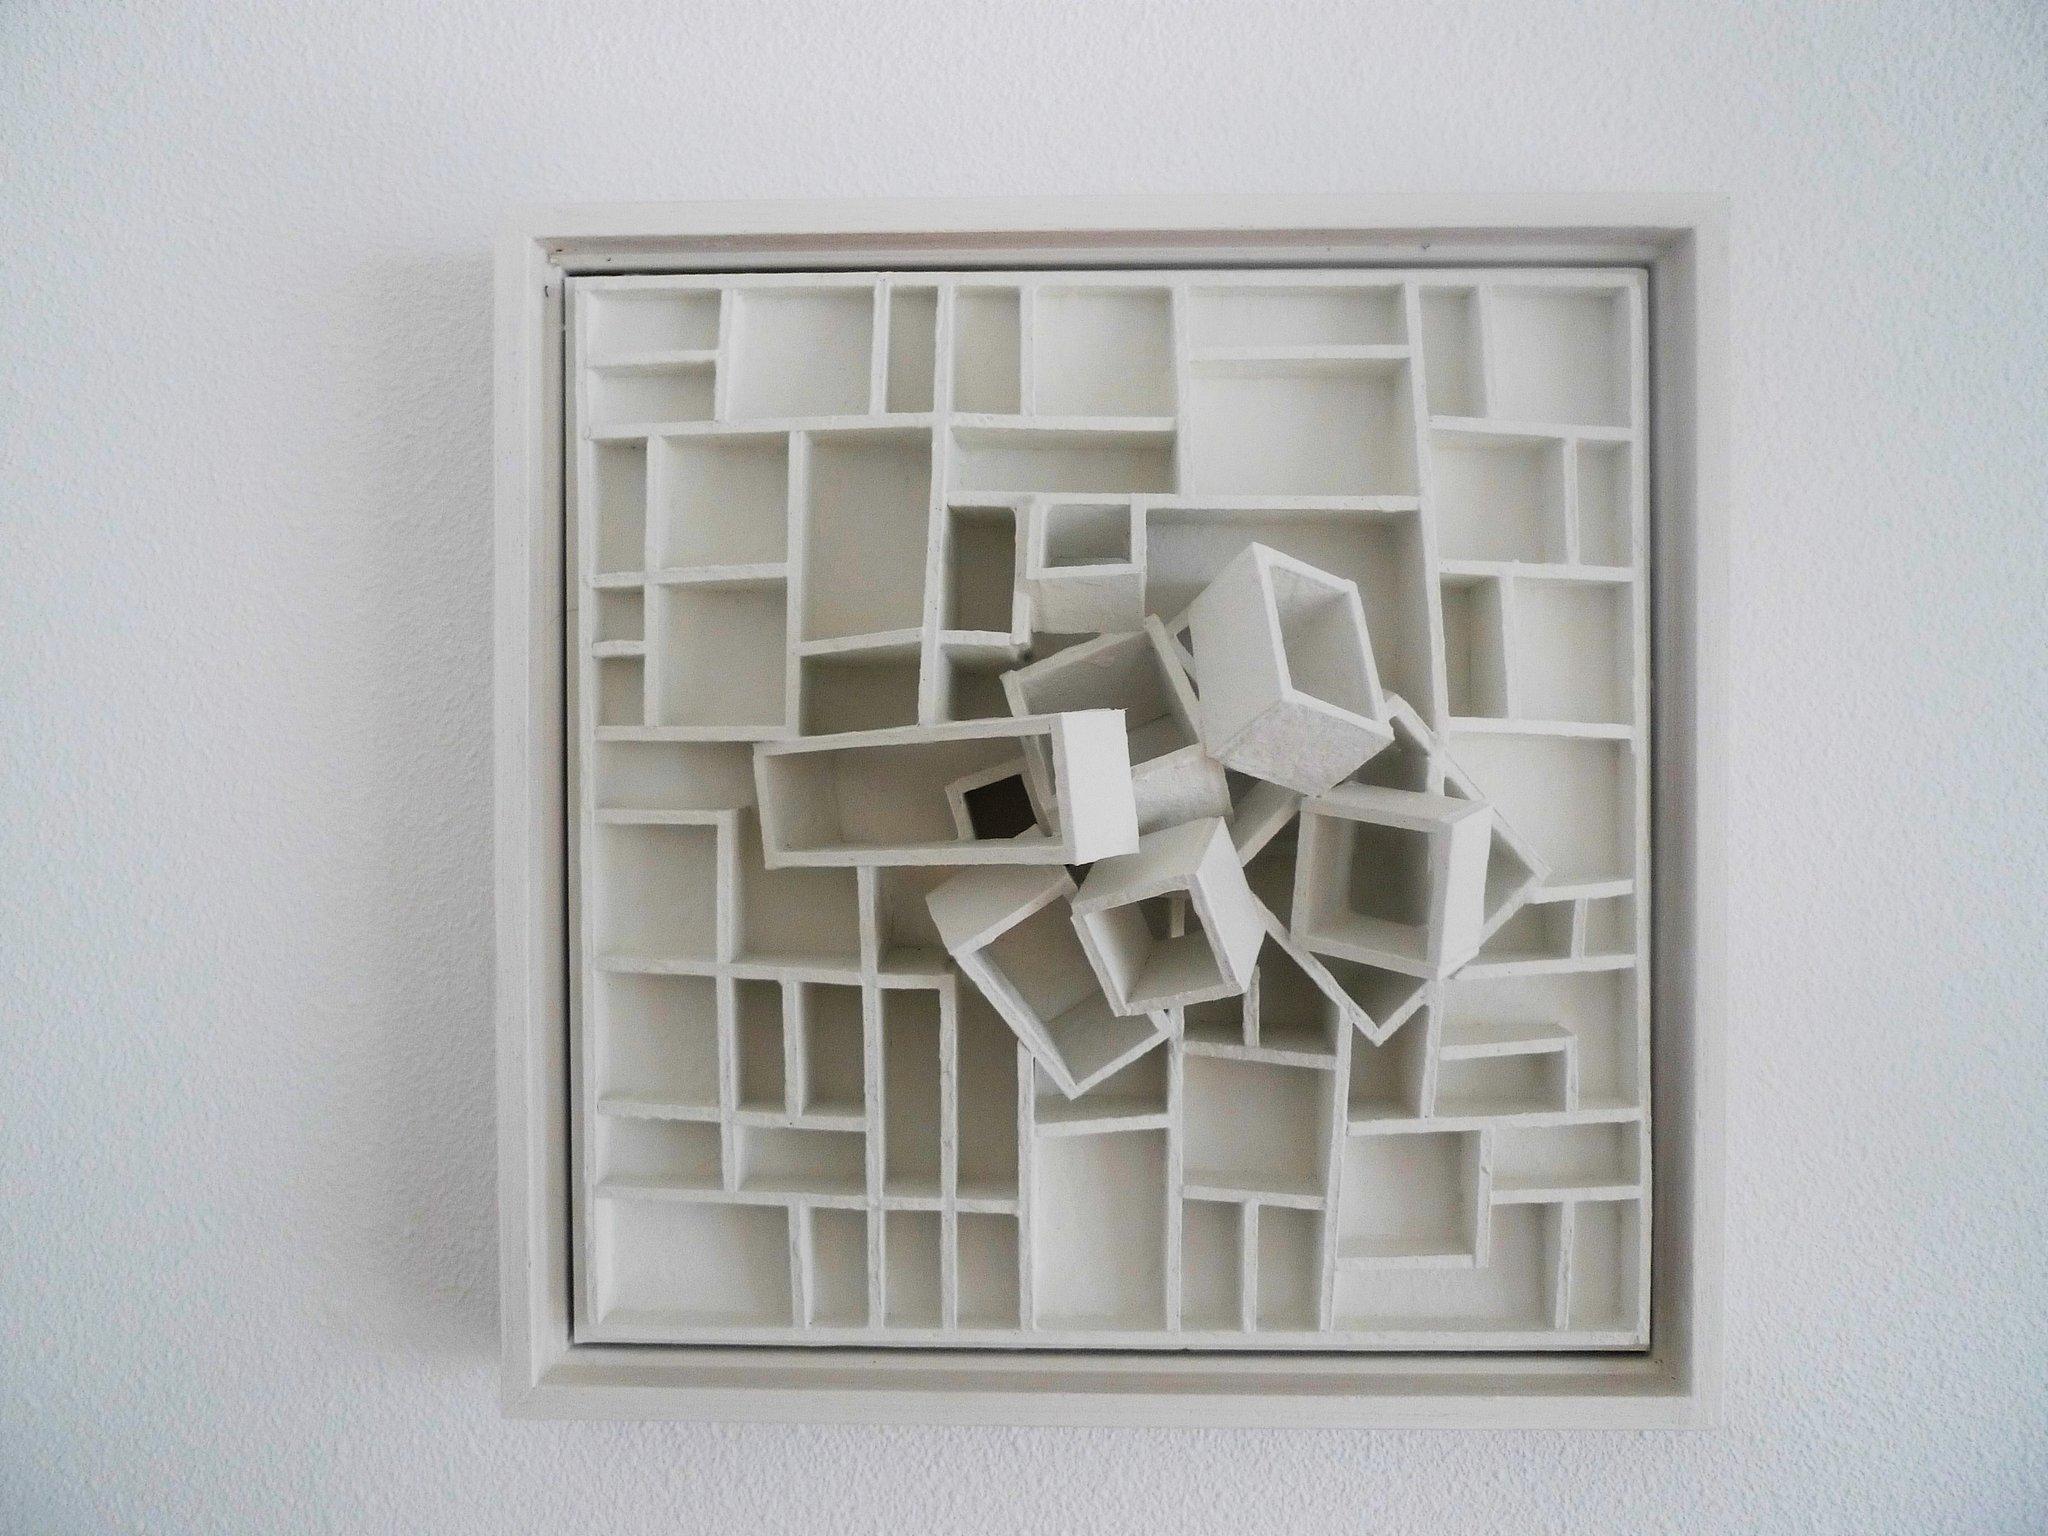 Rob-van-Hemert, Looking for a box (small), 33,5x33,5x12.jpg